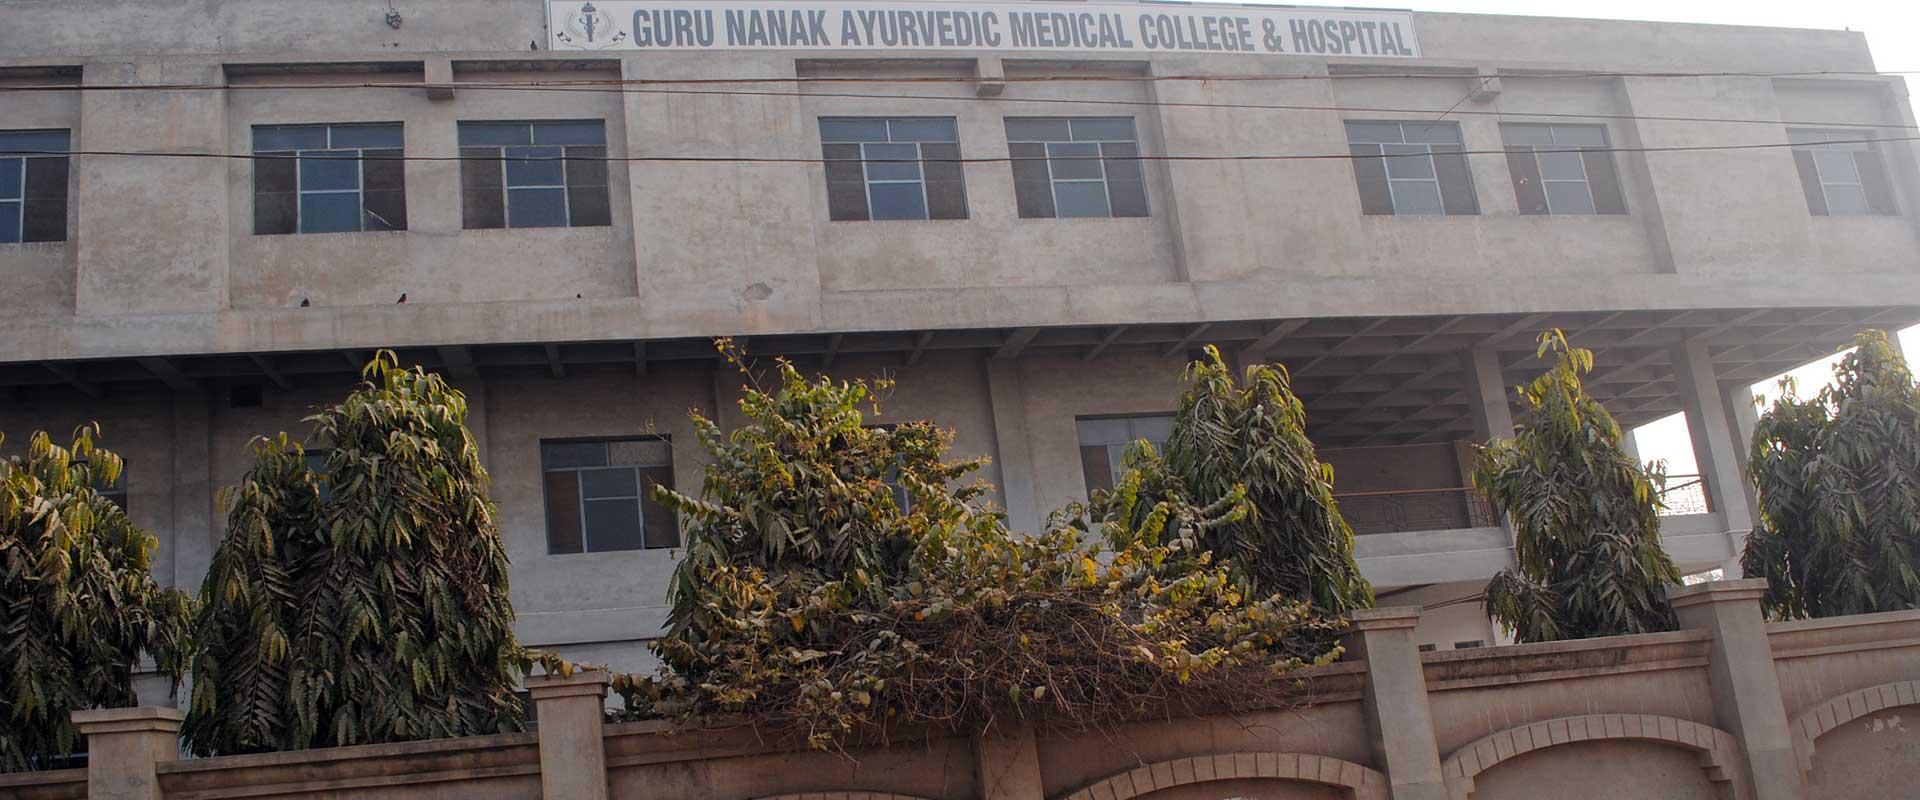 Guru Nanak Ayurvedic Medical College and Hospital, Muktsar